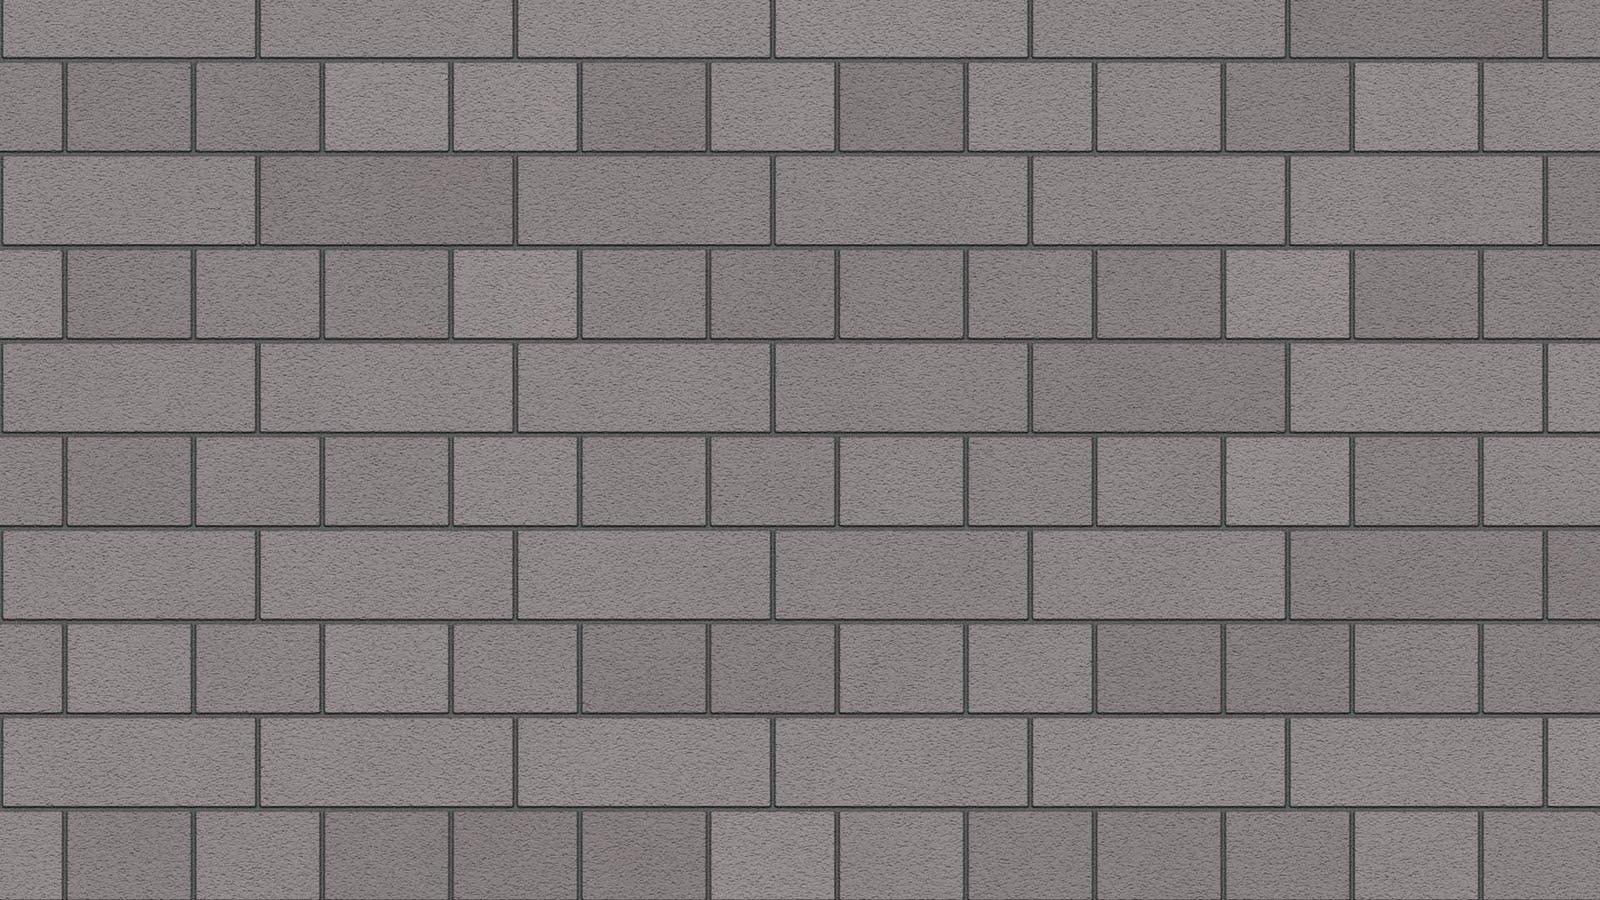 Stenen muur achtergronden hd wallpapers - Zomer keuken steen ...